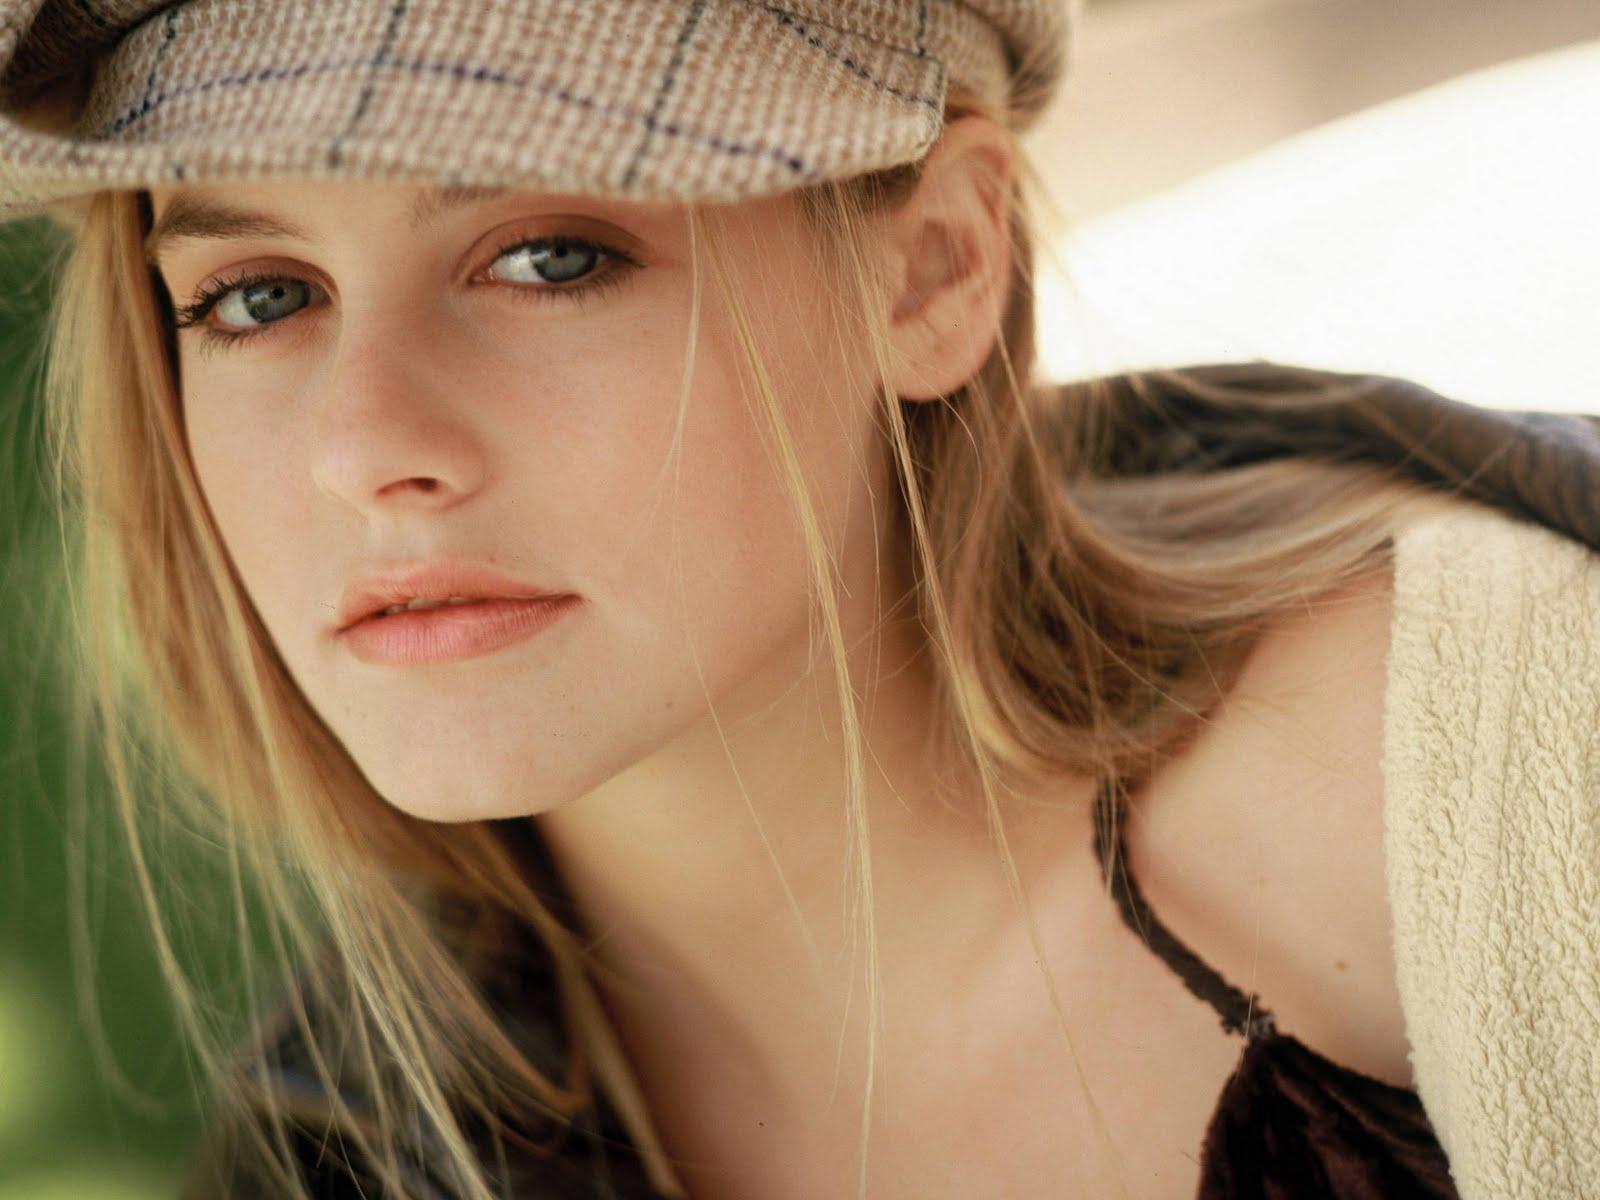 http://2.bp.blogspot.com/-qFE6qbPt_4E/Tcg3CcxxF-I/AAAAAAAABlY/9HUL66wCqH8/s1600/0238-Celebrity-Wallpaper-Alicia-Silverstone.jpg